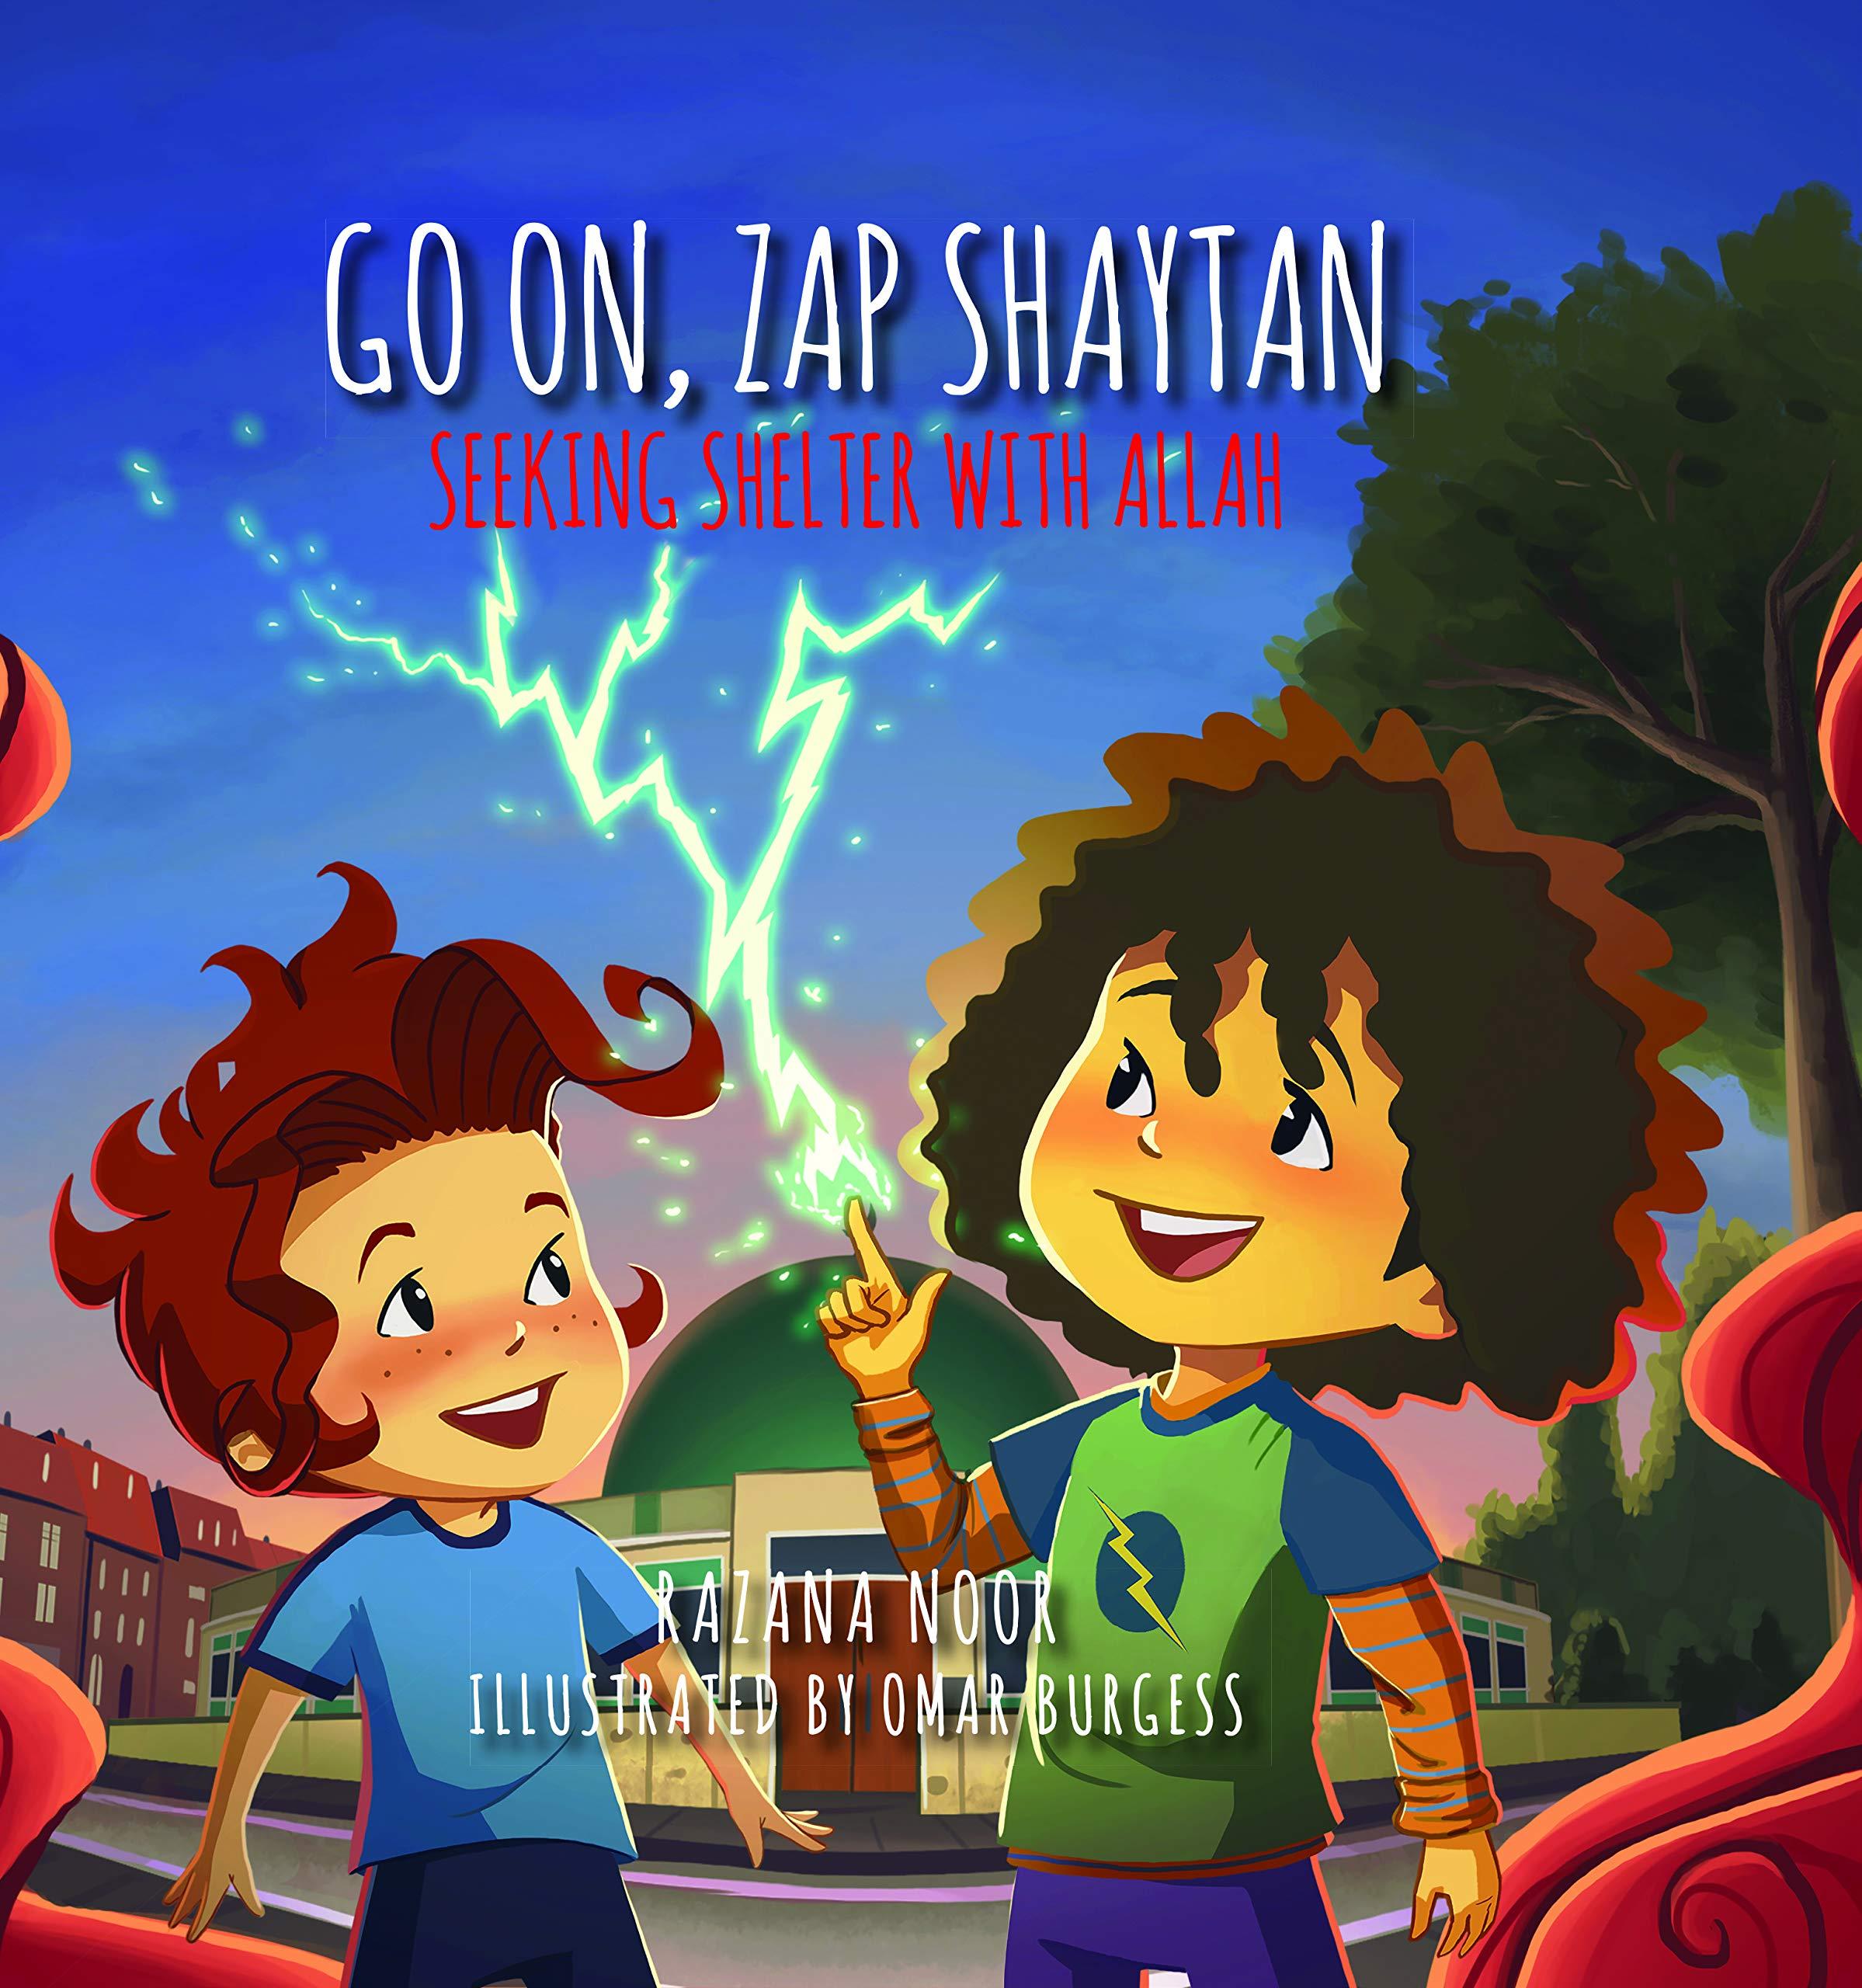 zap shaytan